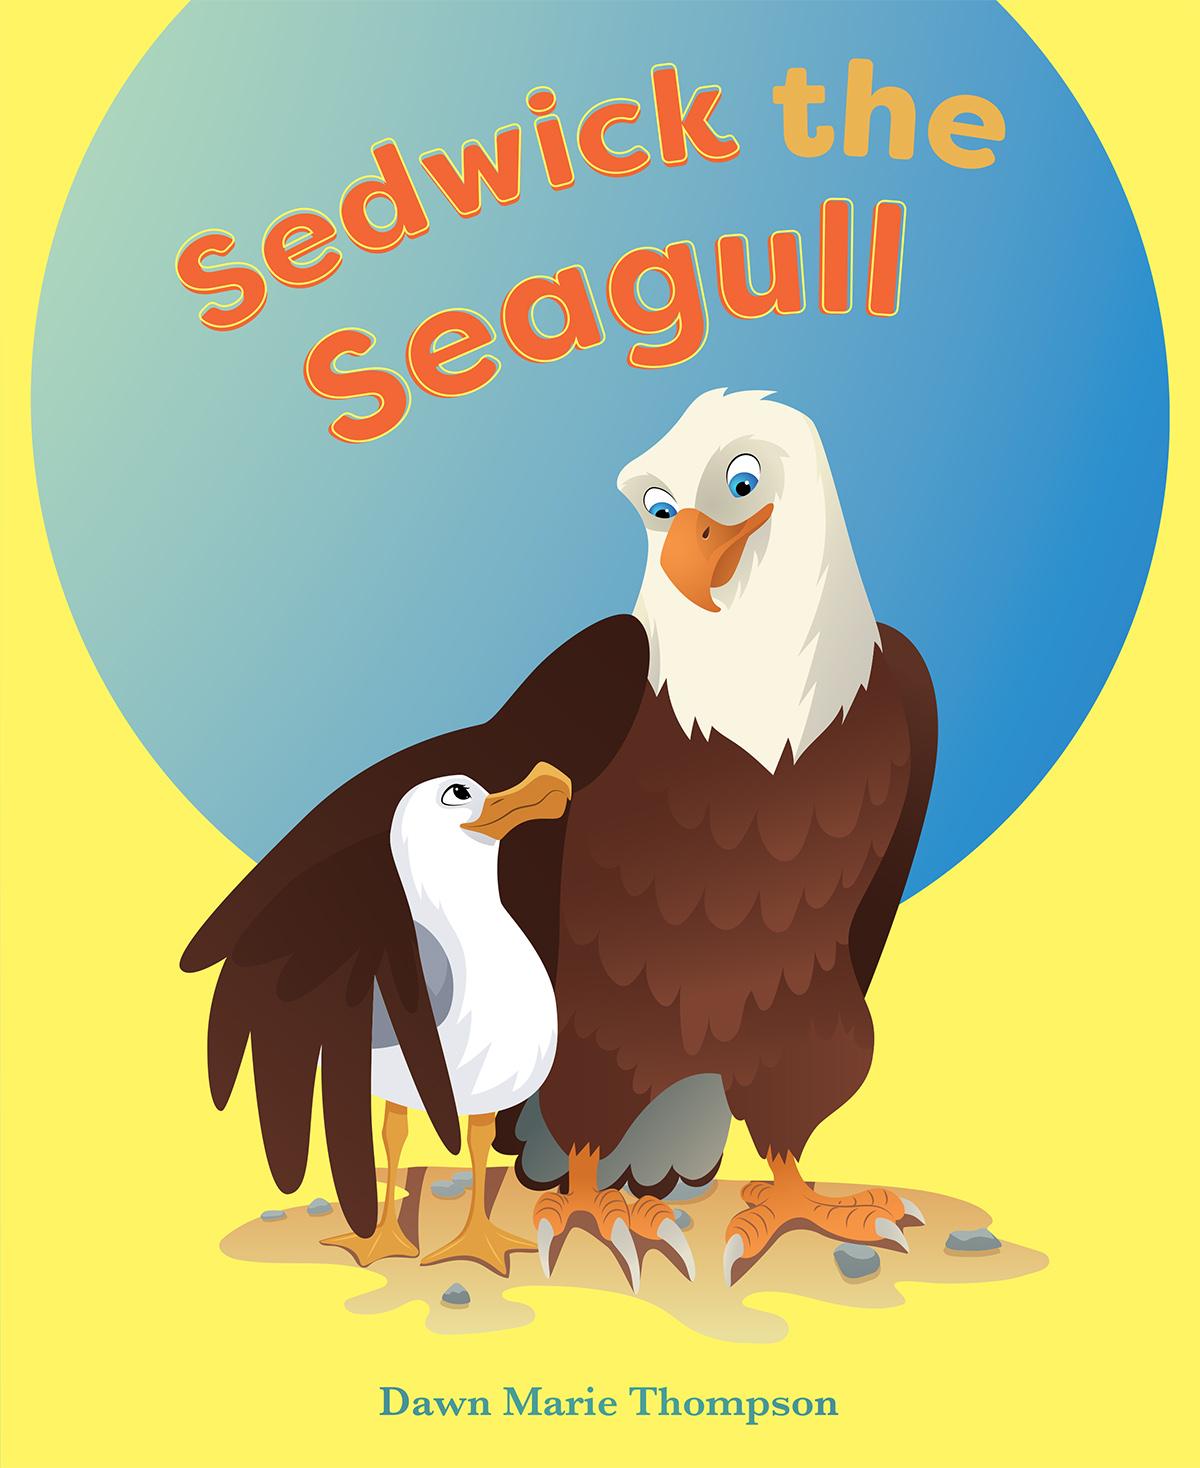 SedwicktheEagle_Amazon